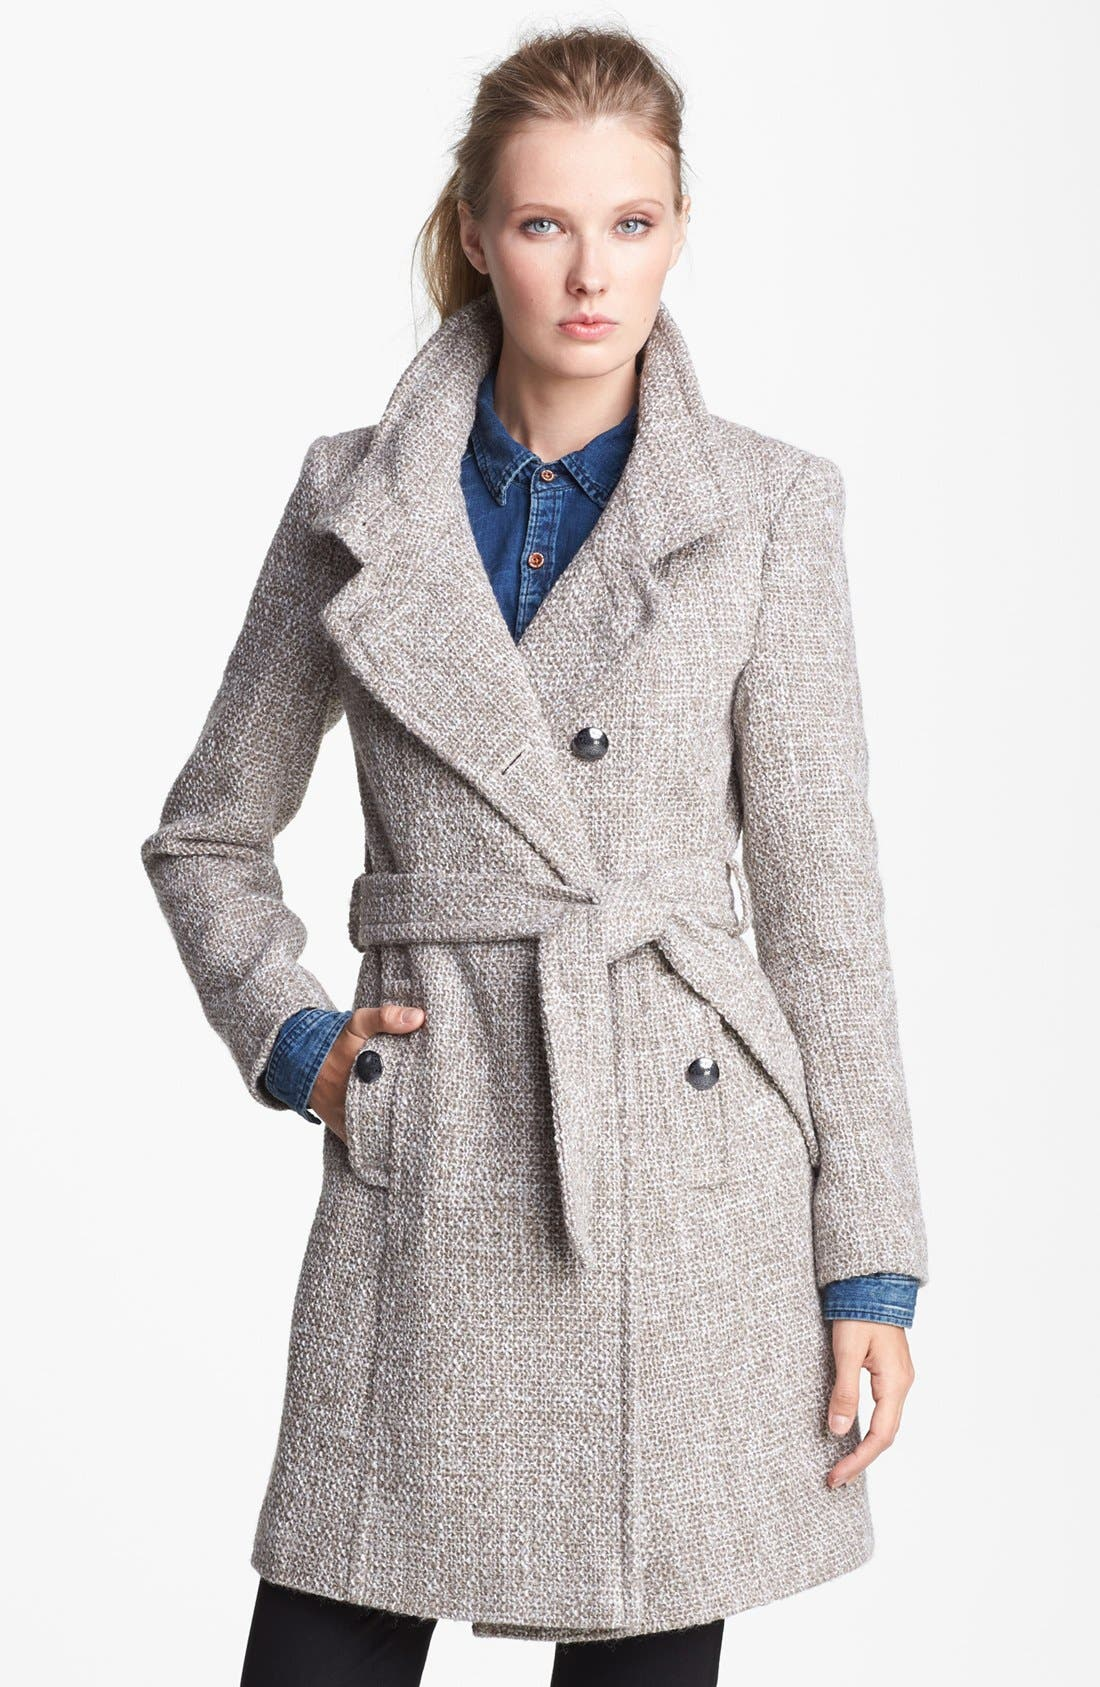 Alternate Image 1 Selected - T Tahari 'Izzy' Belted Tweed Coat (Online Only)